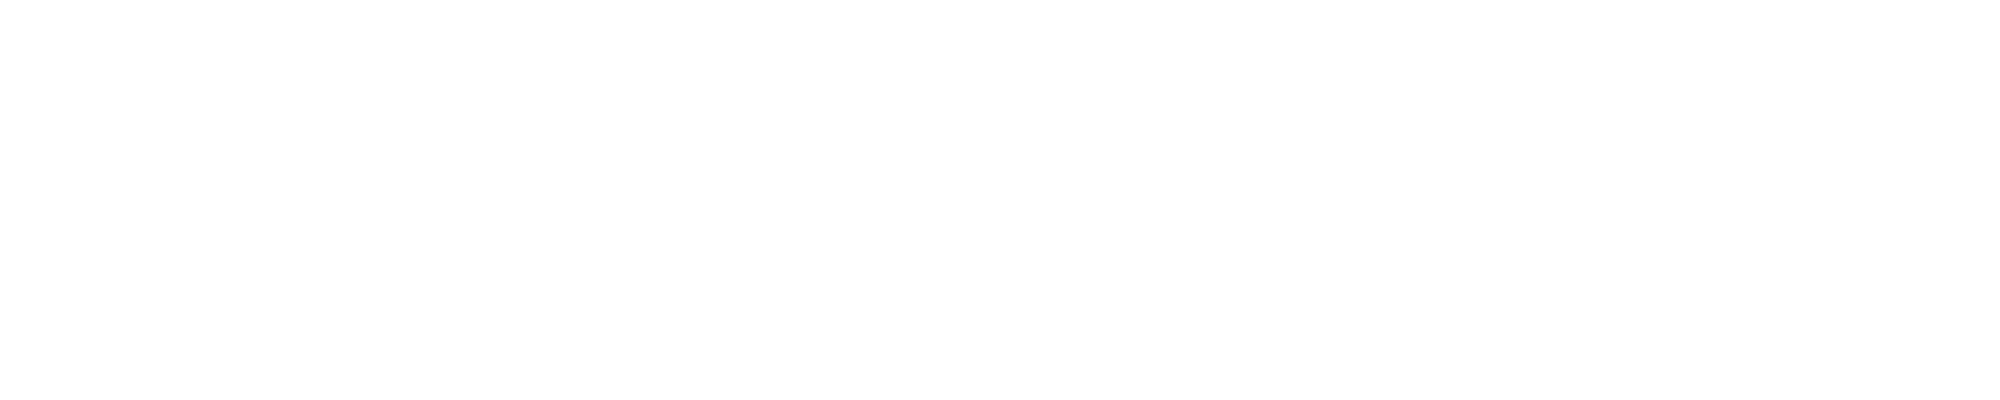 Maximilian Euler